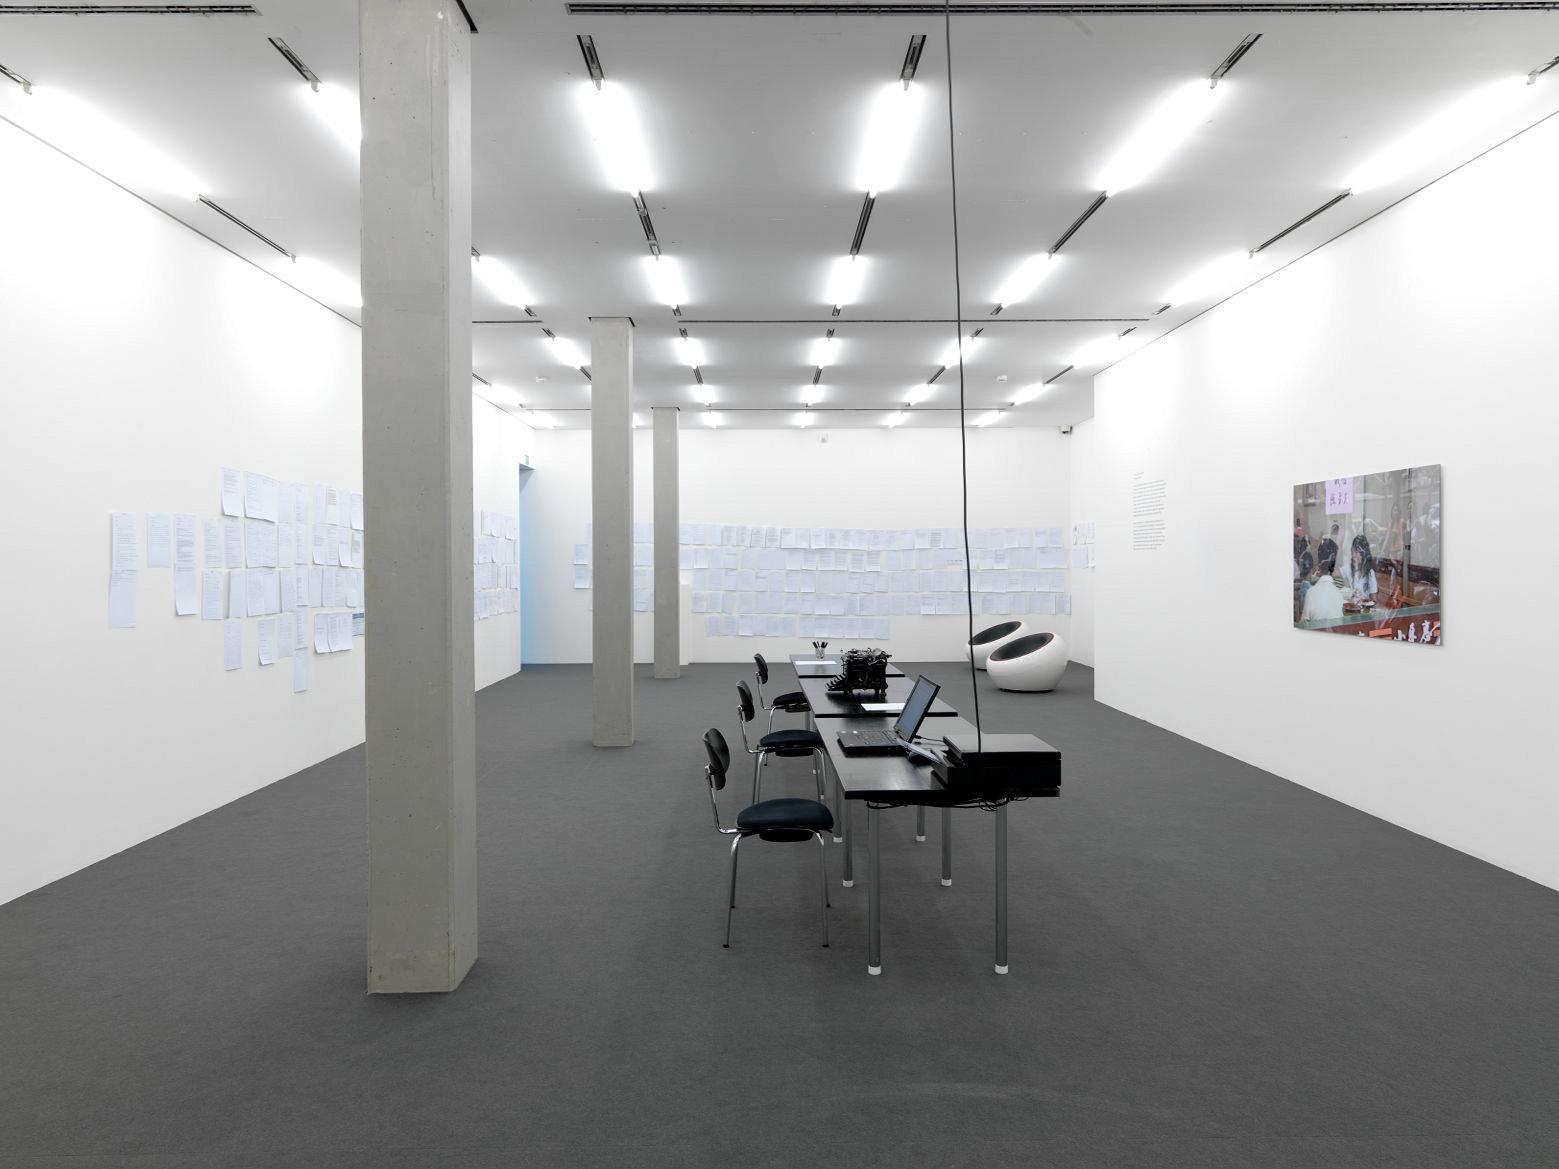 all_the_stories_2_Ausstellungsansicht_Kestnergesellschaft.jpg